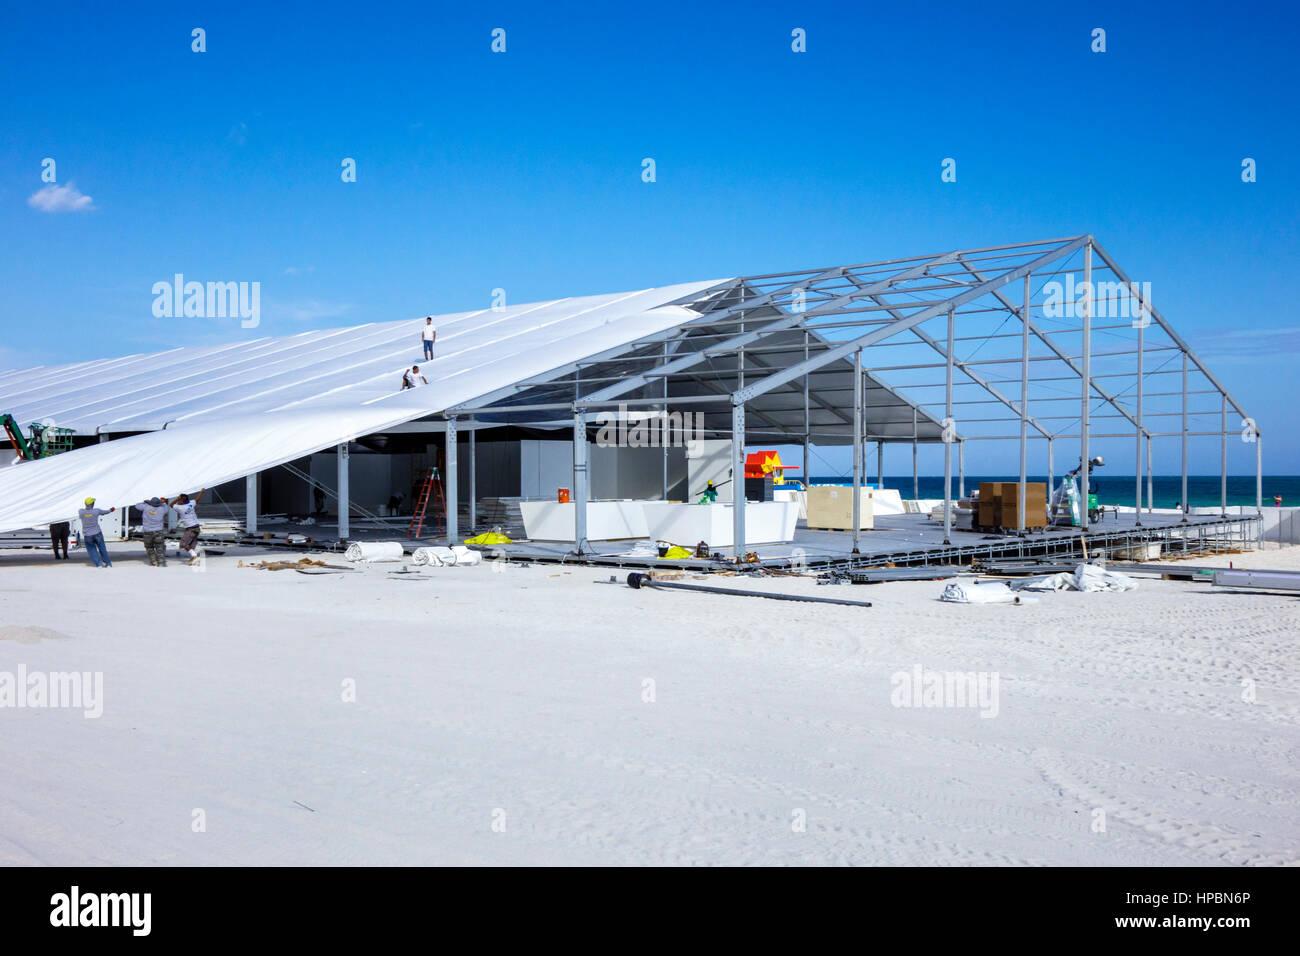 Miami Beach Florida Lummus Park Art Basel Week sand event tent assemble disassemble temporary building frame metal - Stock Image